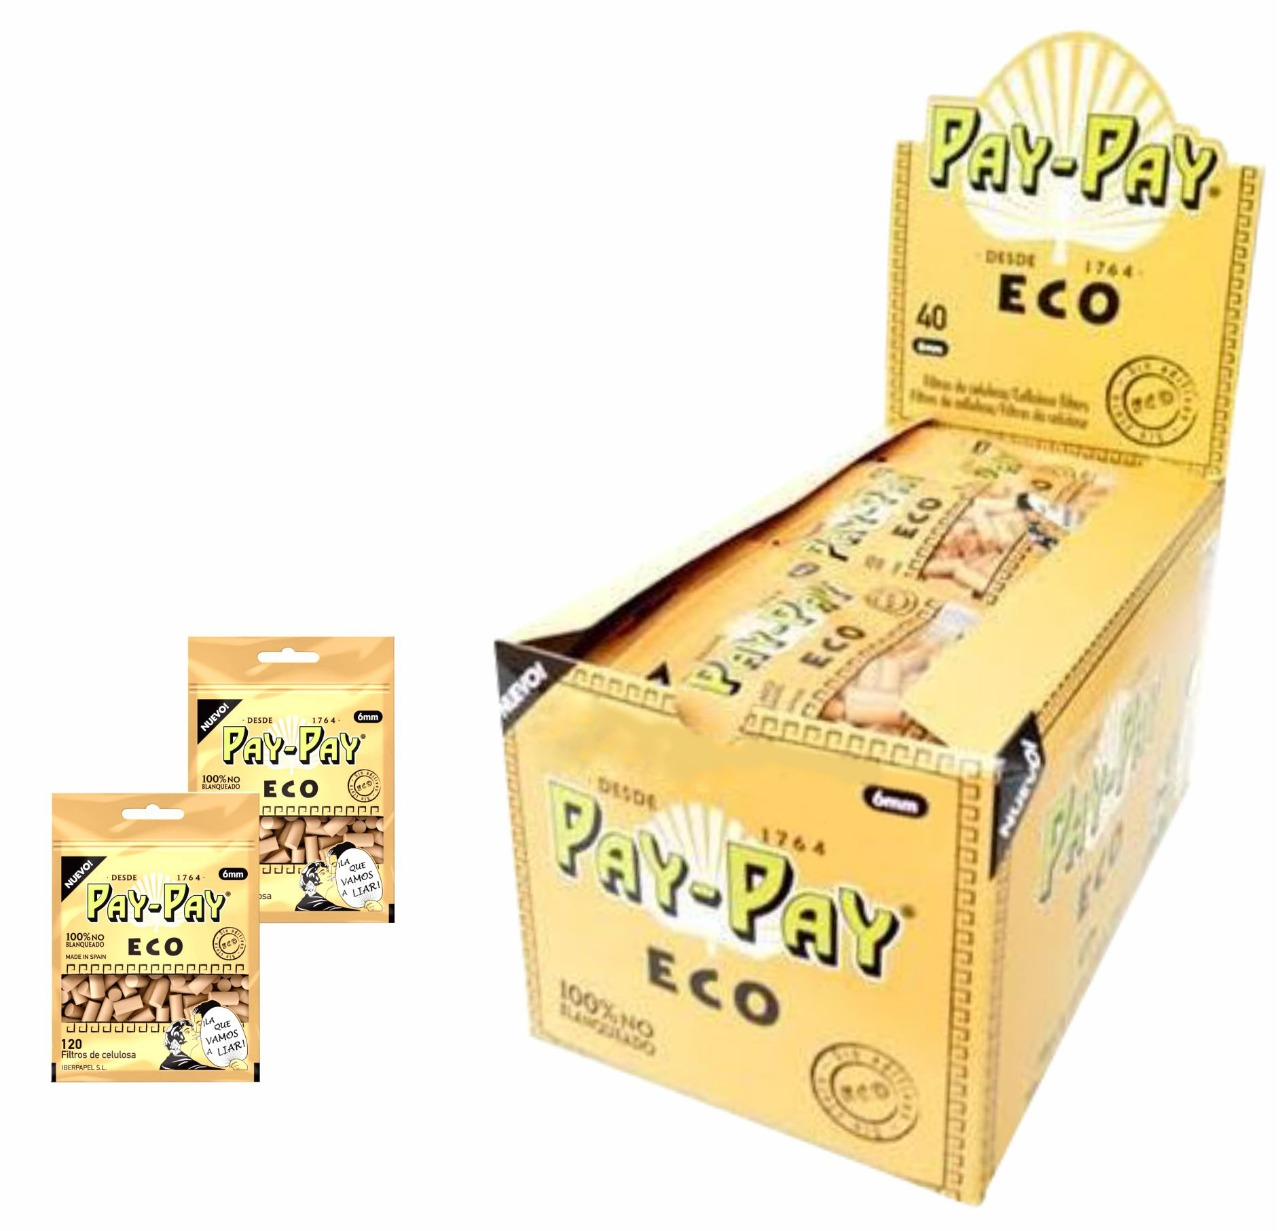 FILTRO ENROLAR PAY-PAY ECO 6MM